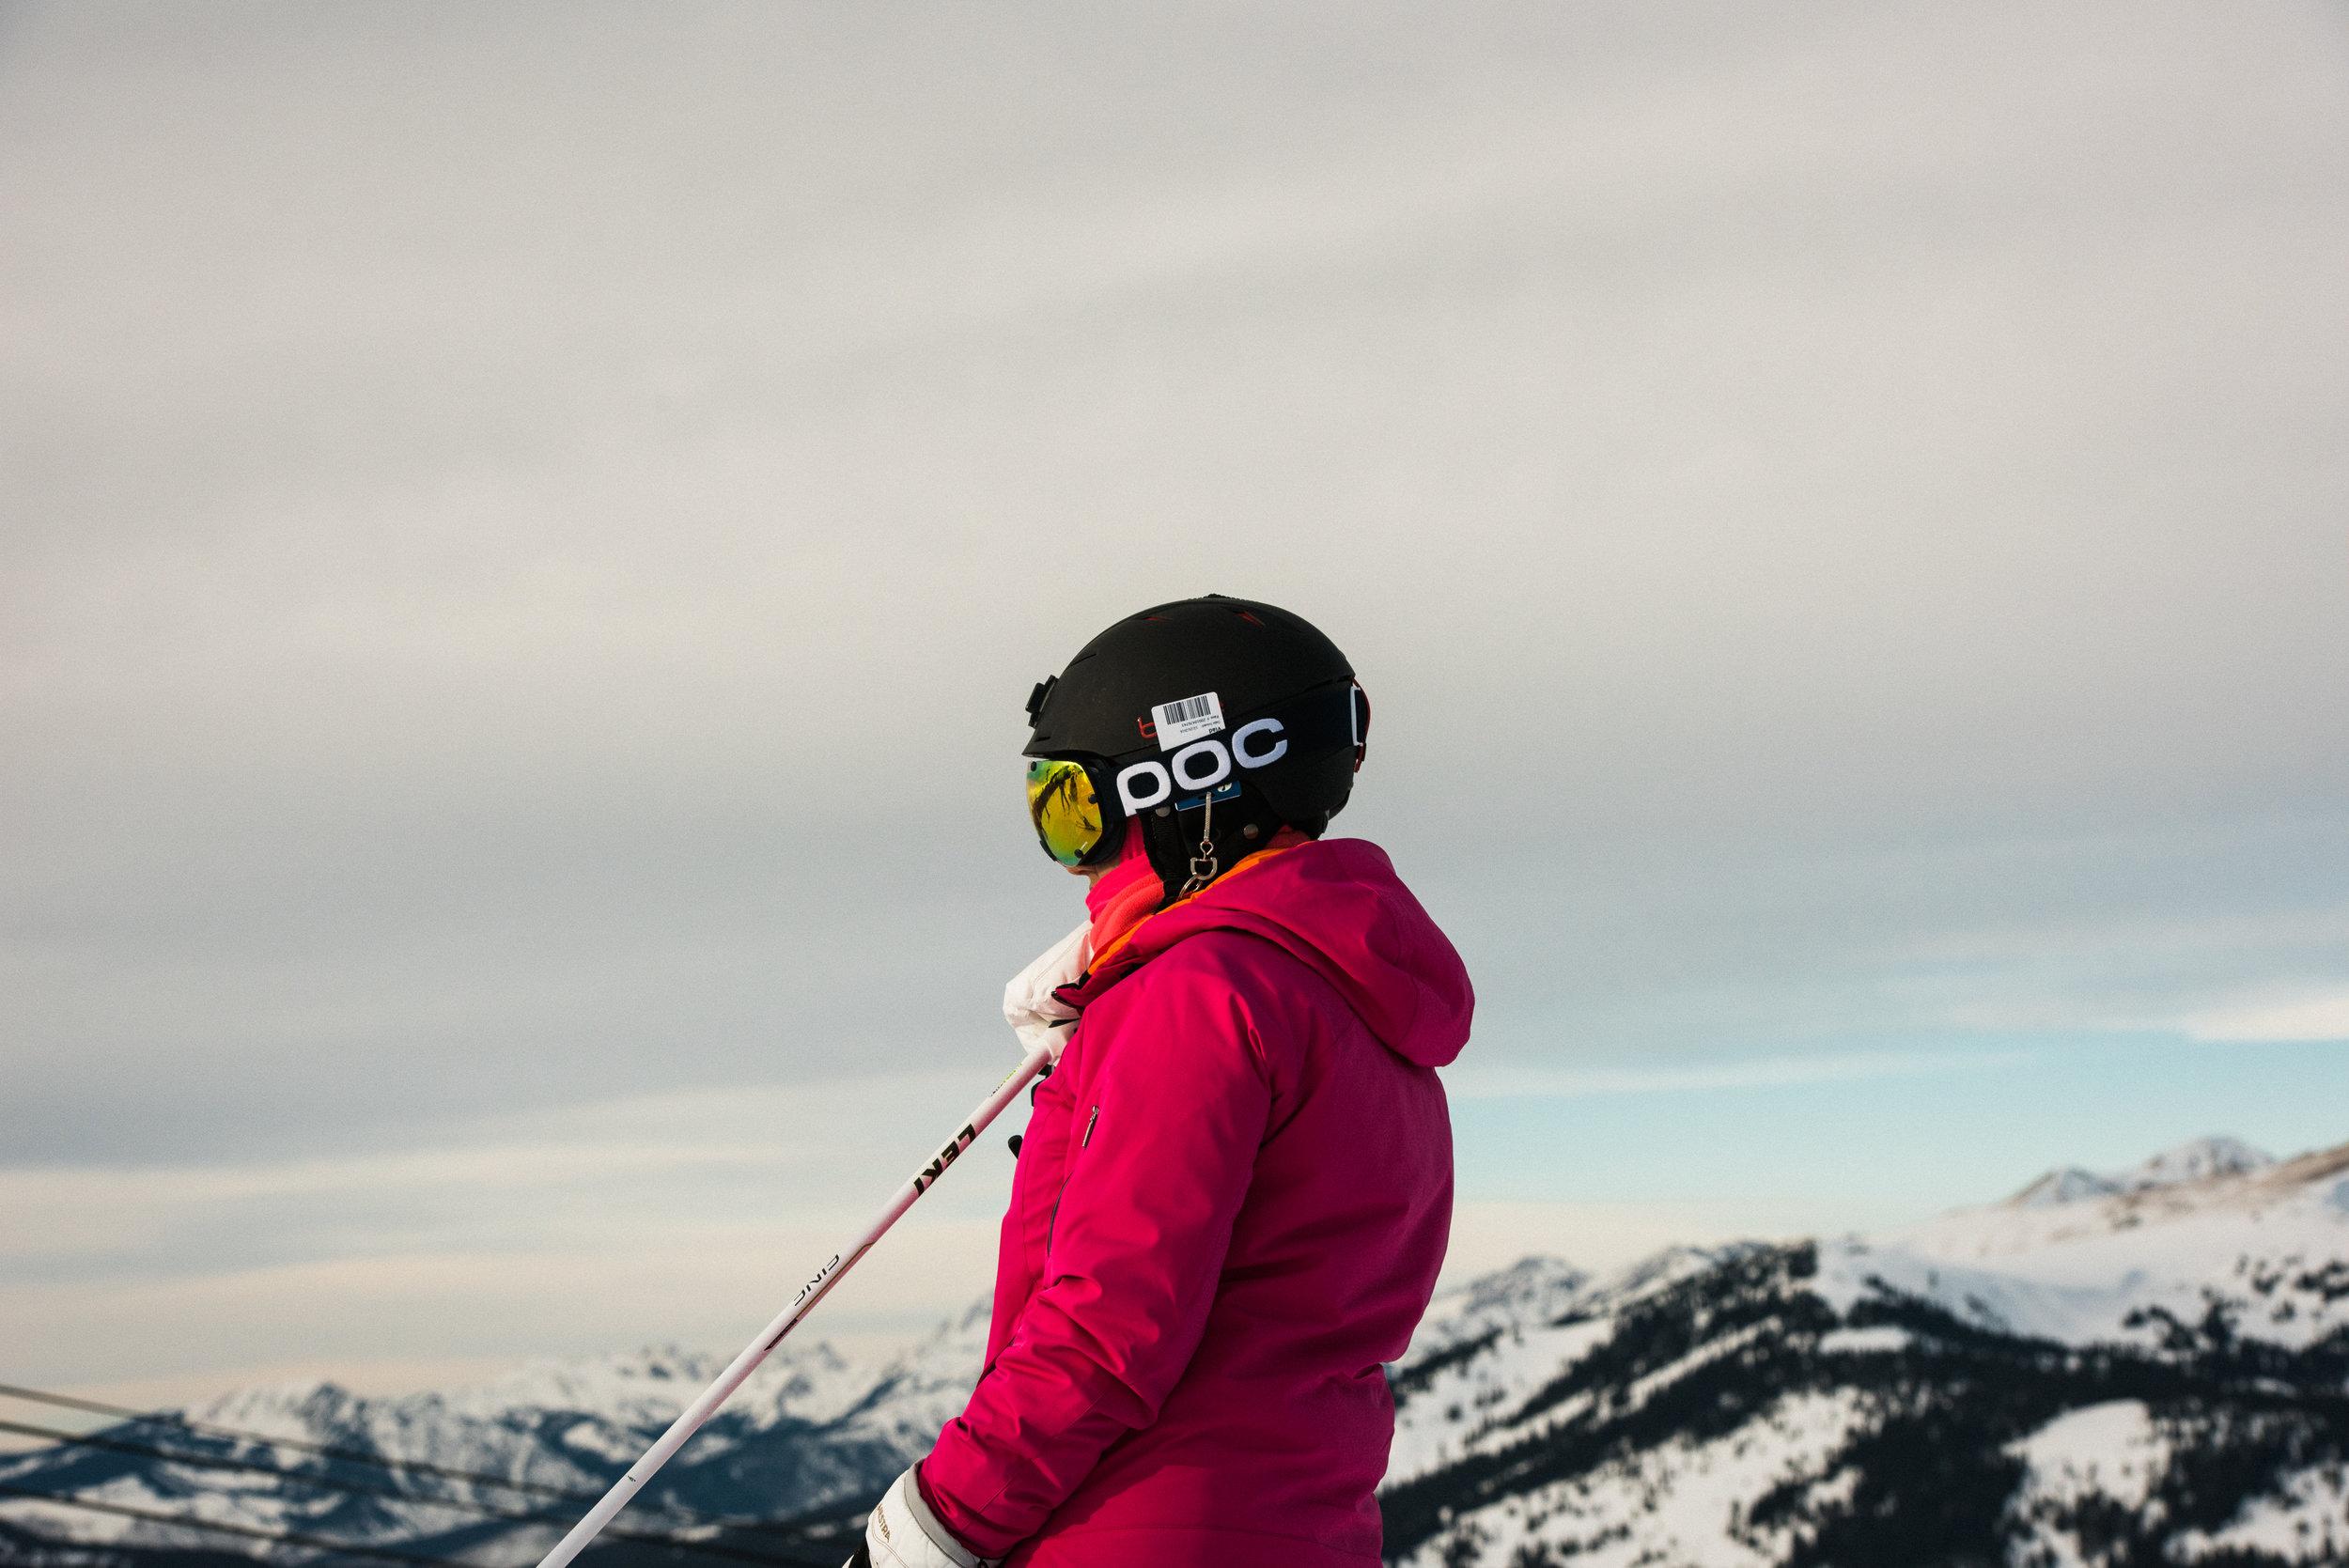 TaraShupe_Outdoor_Photographer_Loweprobags_Colorado_Copper_Mountains_Ski_68.jpg